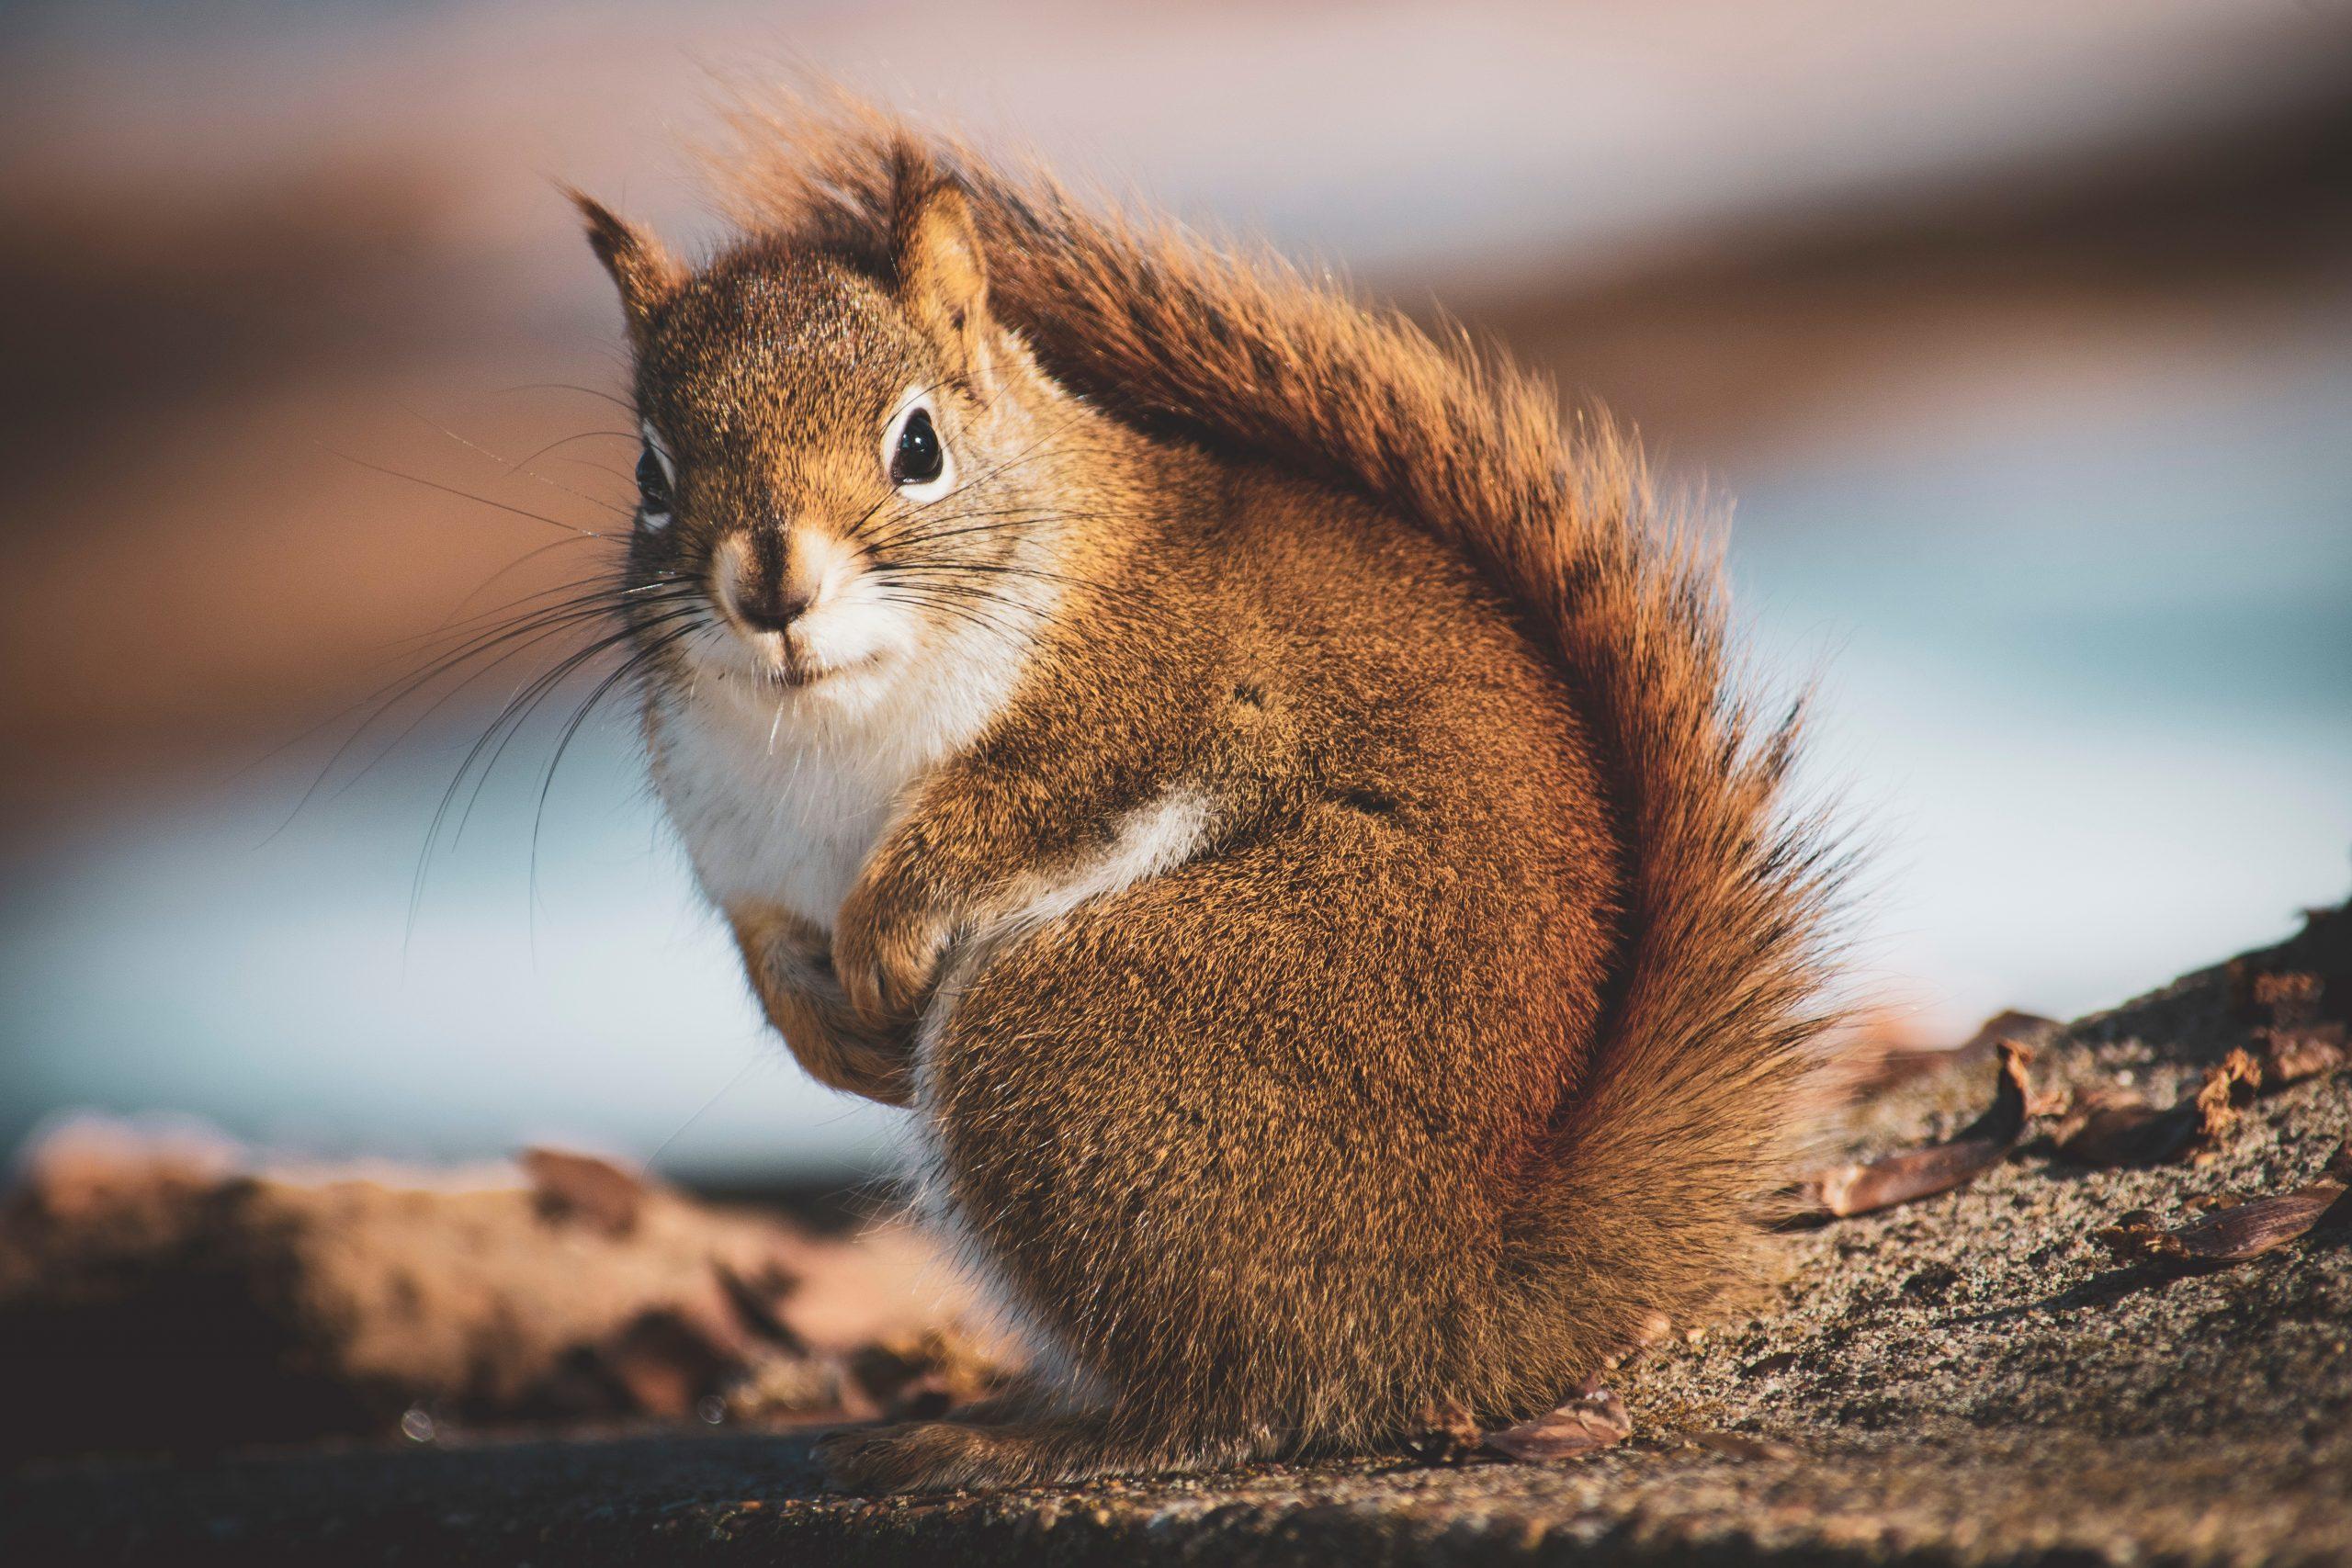 Écureuil-Tamia rayé